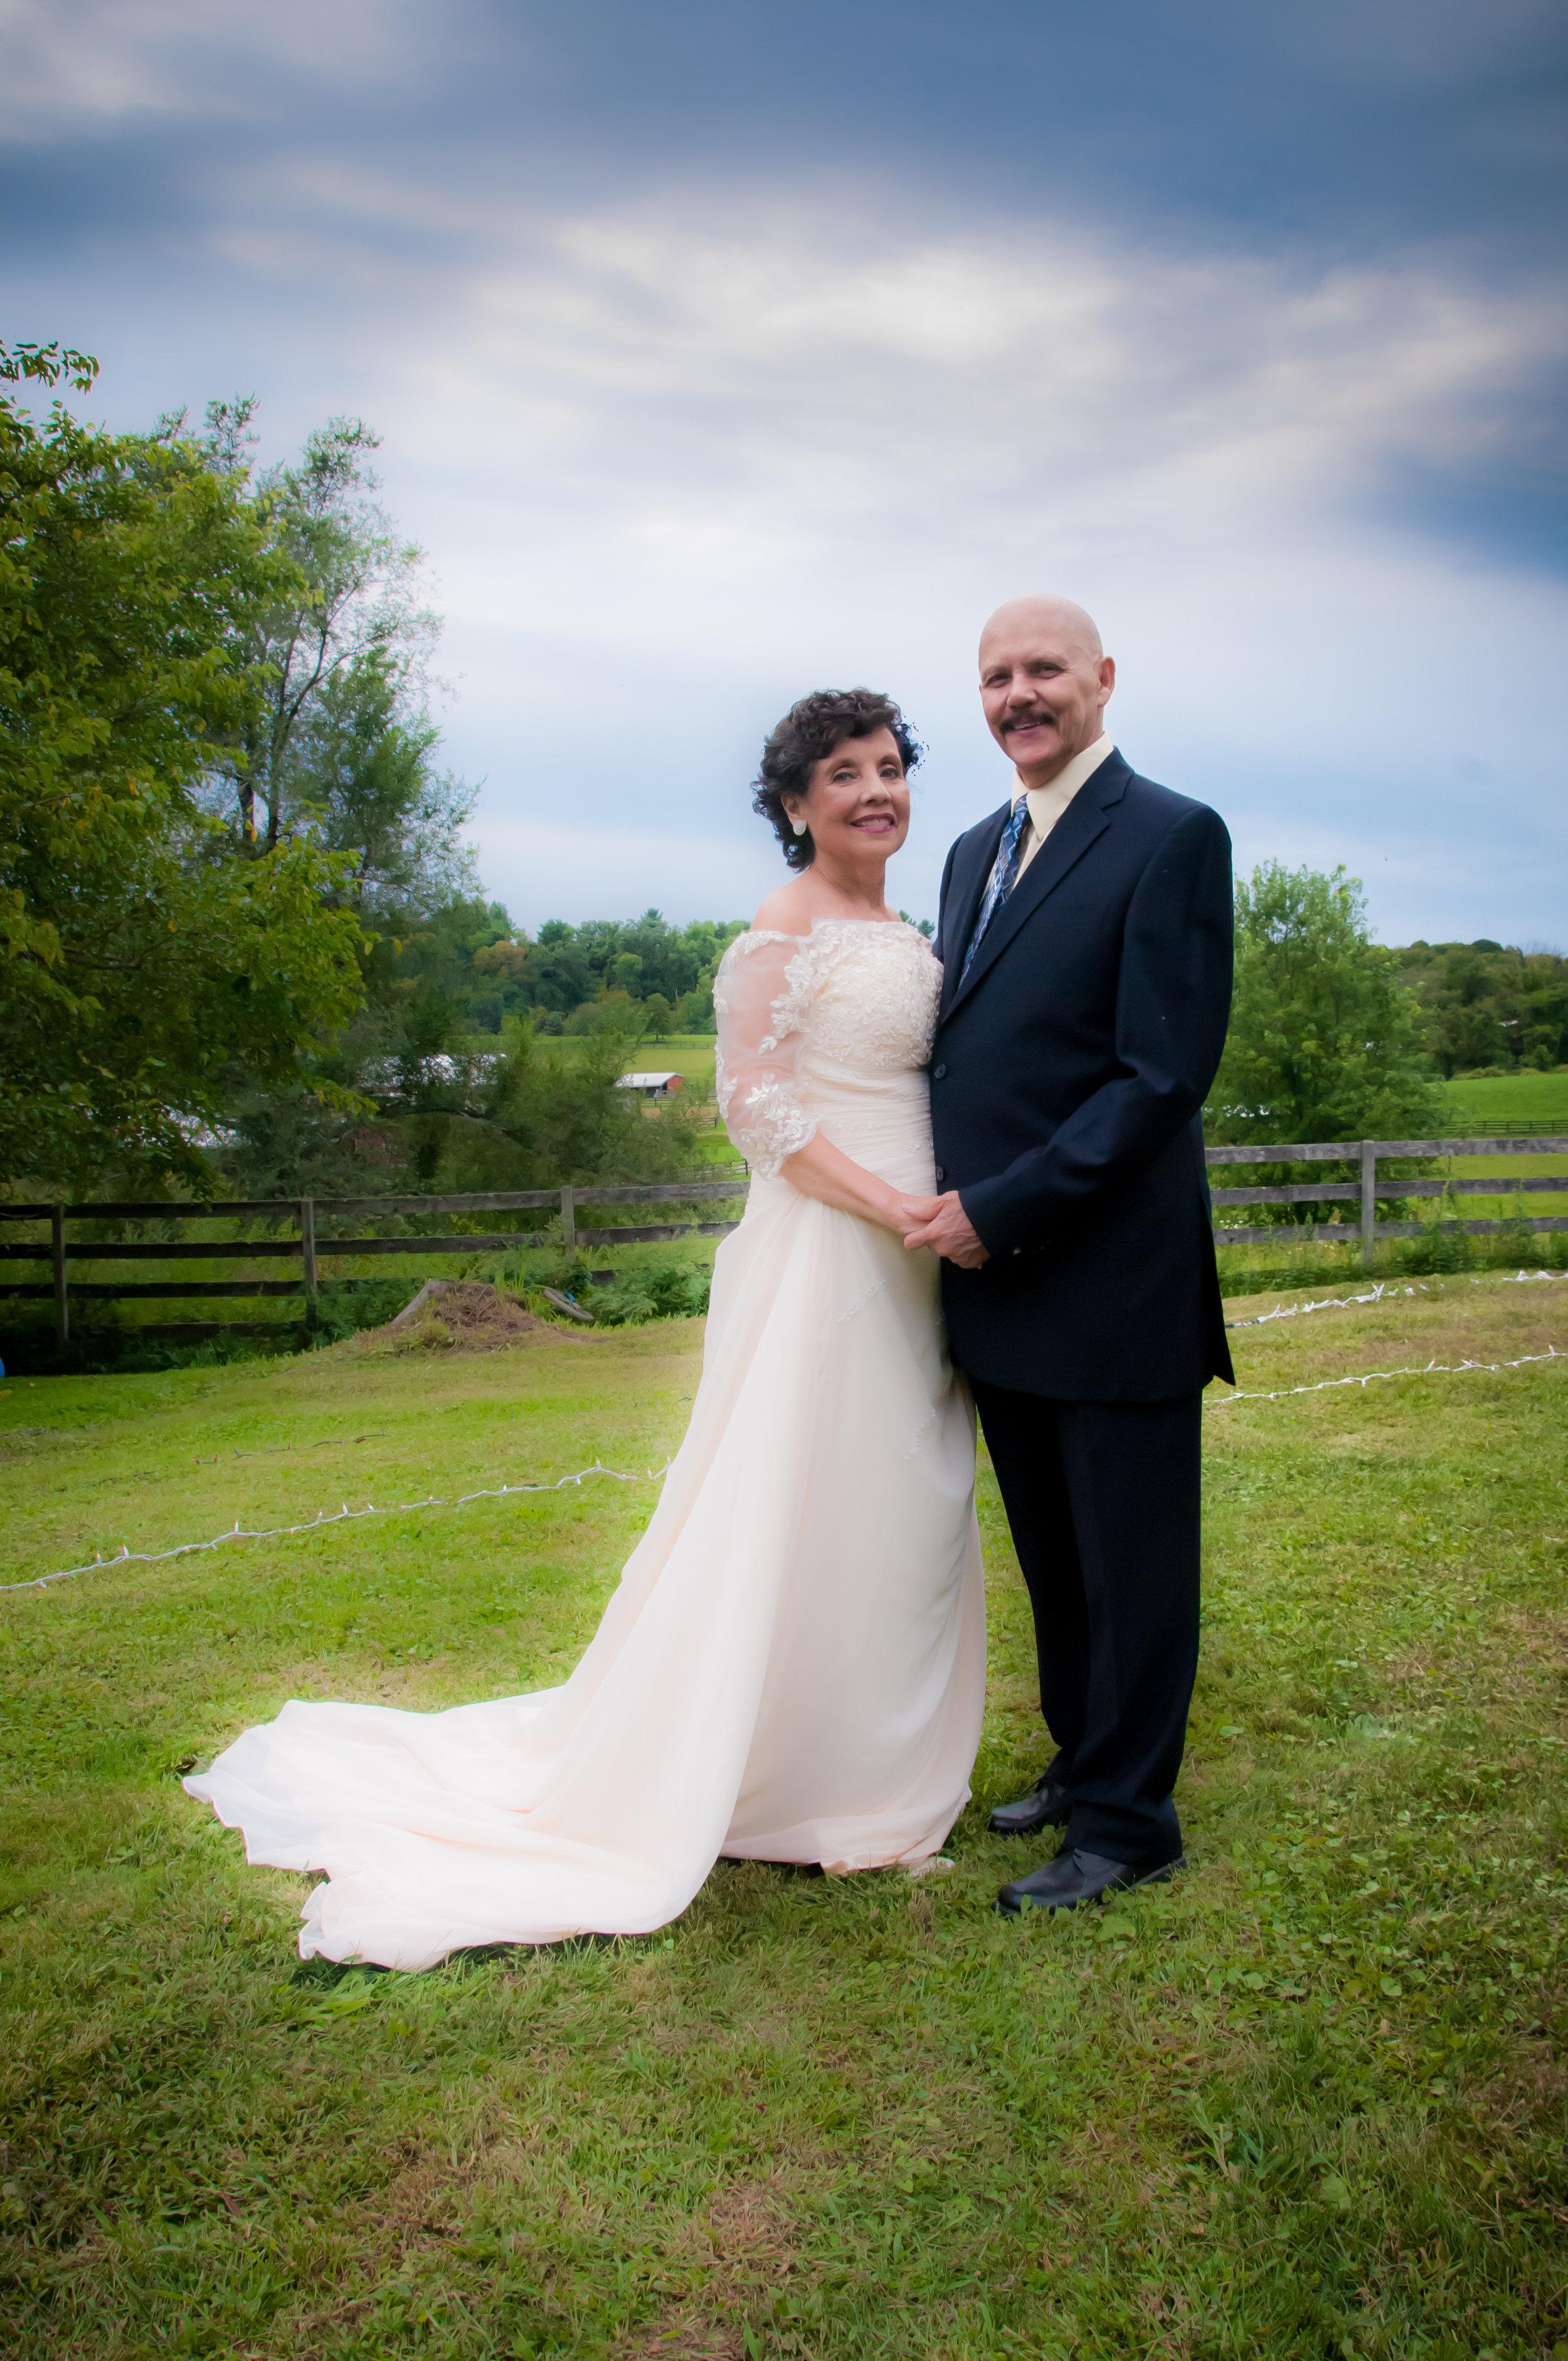 Carrie_Weston_Studios_NY_Wedding_TonandLindaColon-254-2.jpg